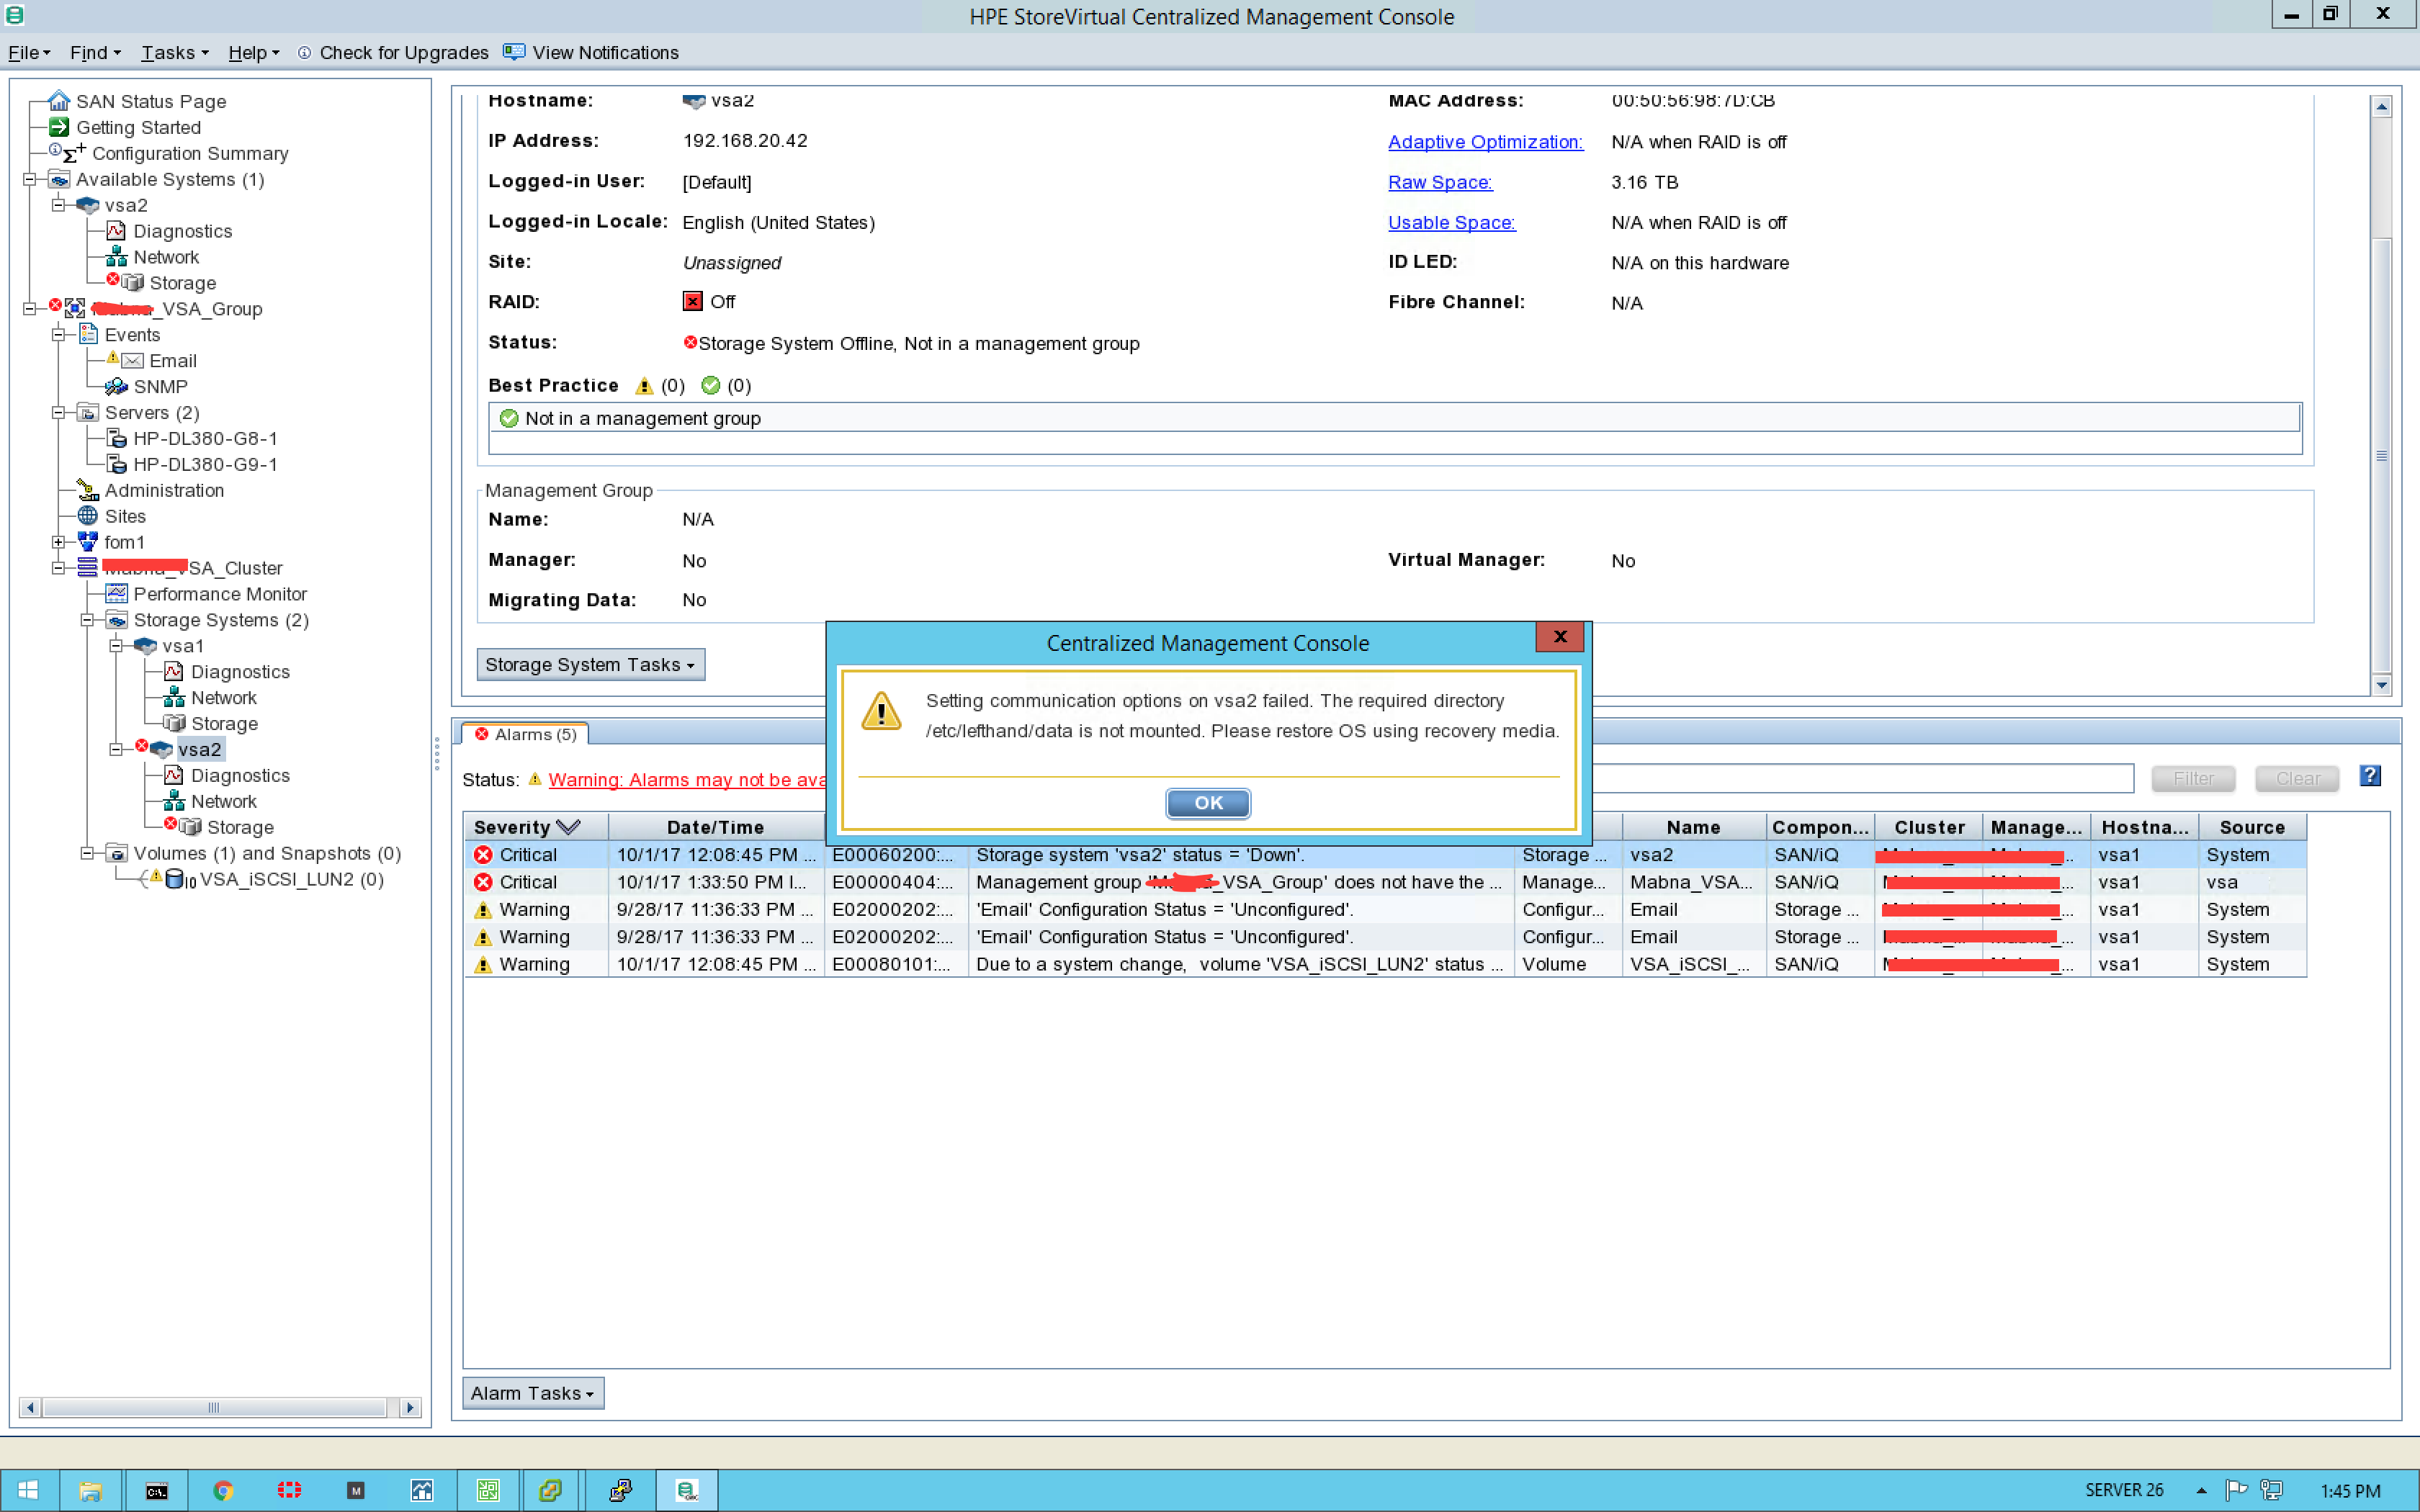 HP StoreVirtual VSA Storage RAID is off - Hewlett Packard Enterprise